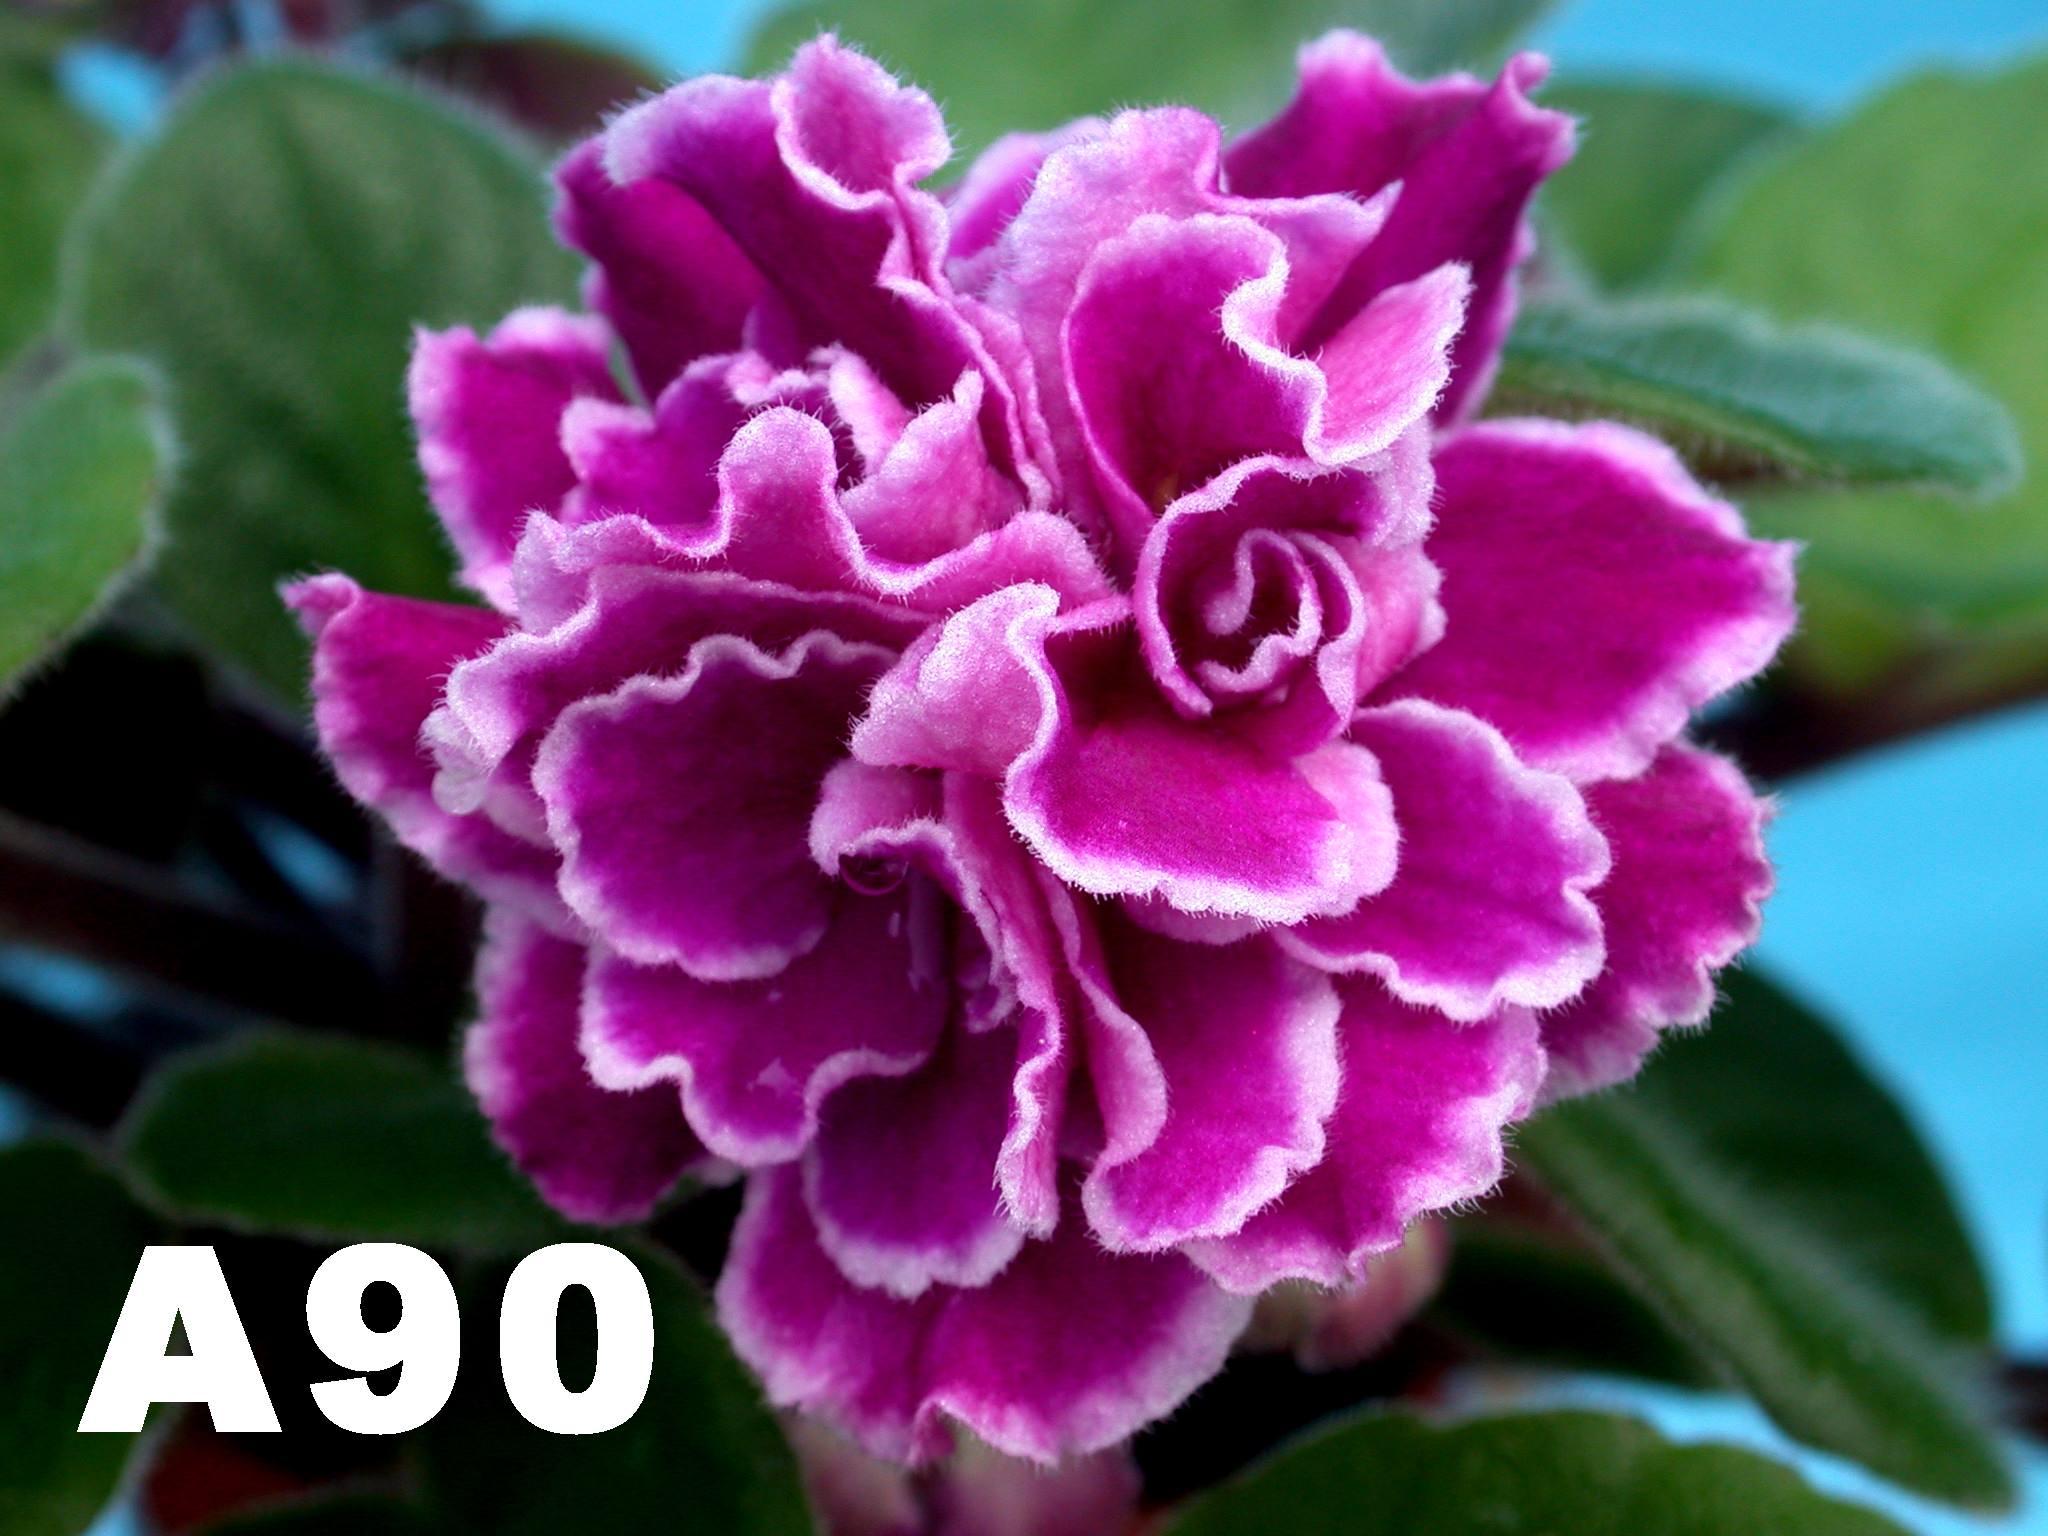 [A90] A90